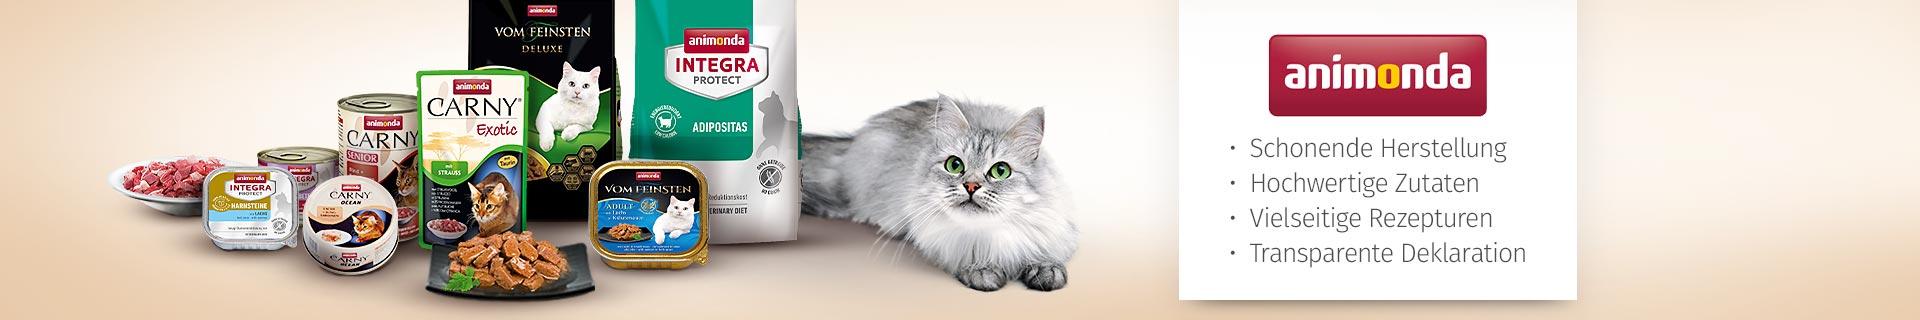 Animonda Katze